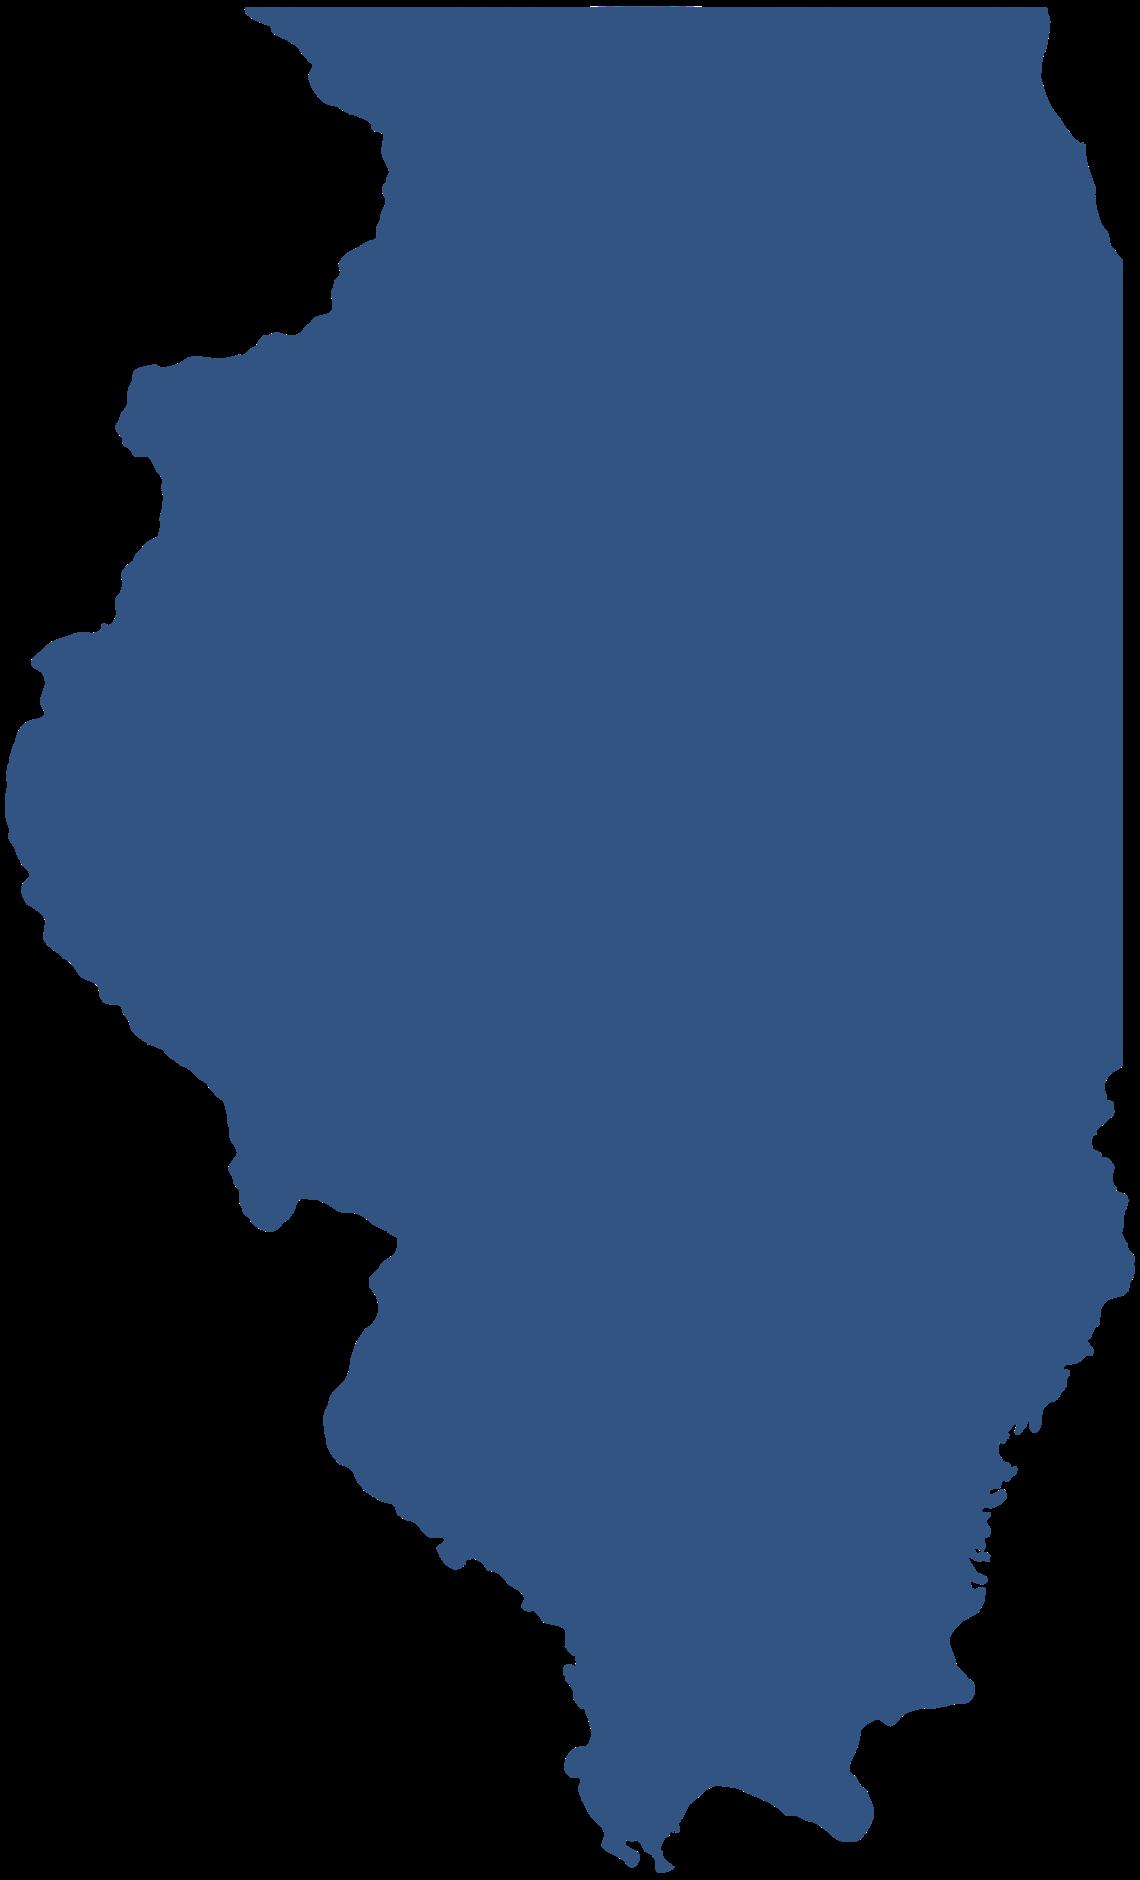 - State's Rank by Arab American Population: 5AAI Estimated Arab American Population: 142,687*